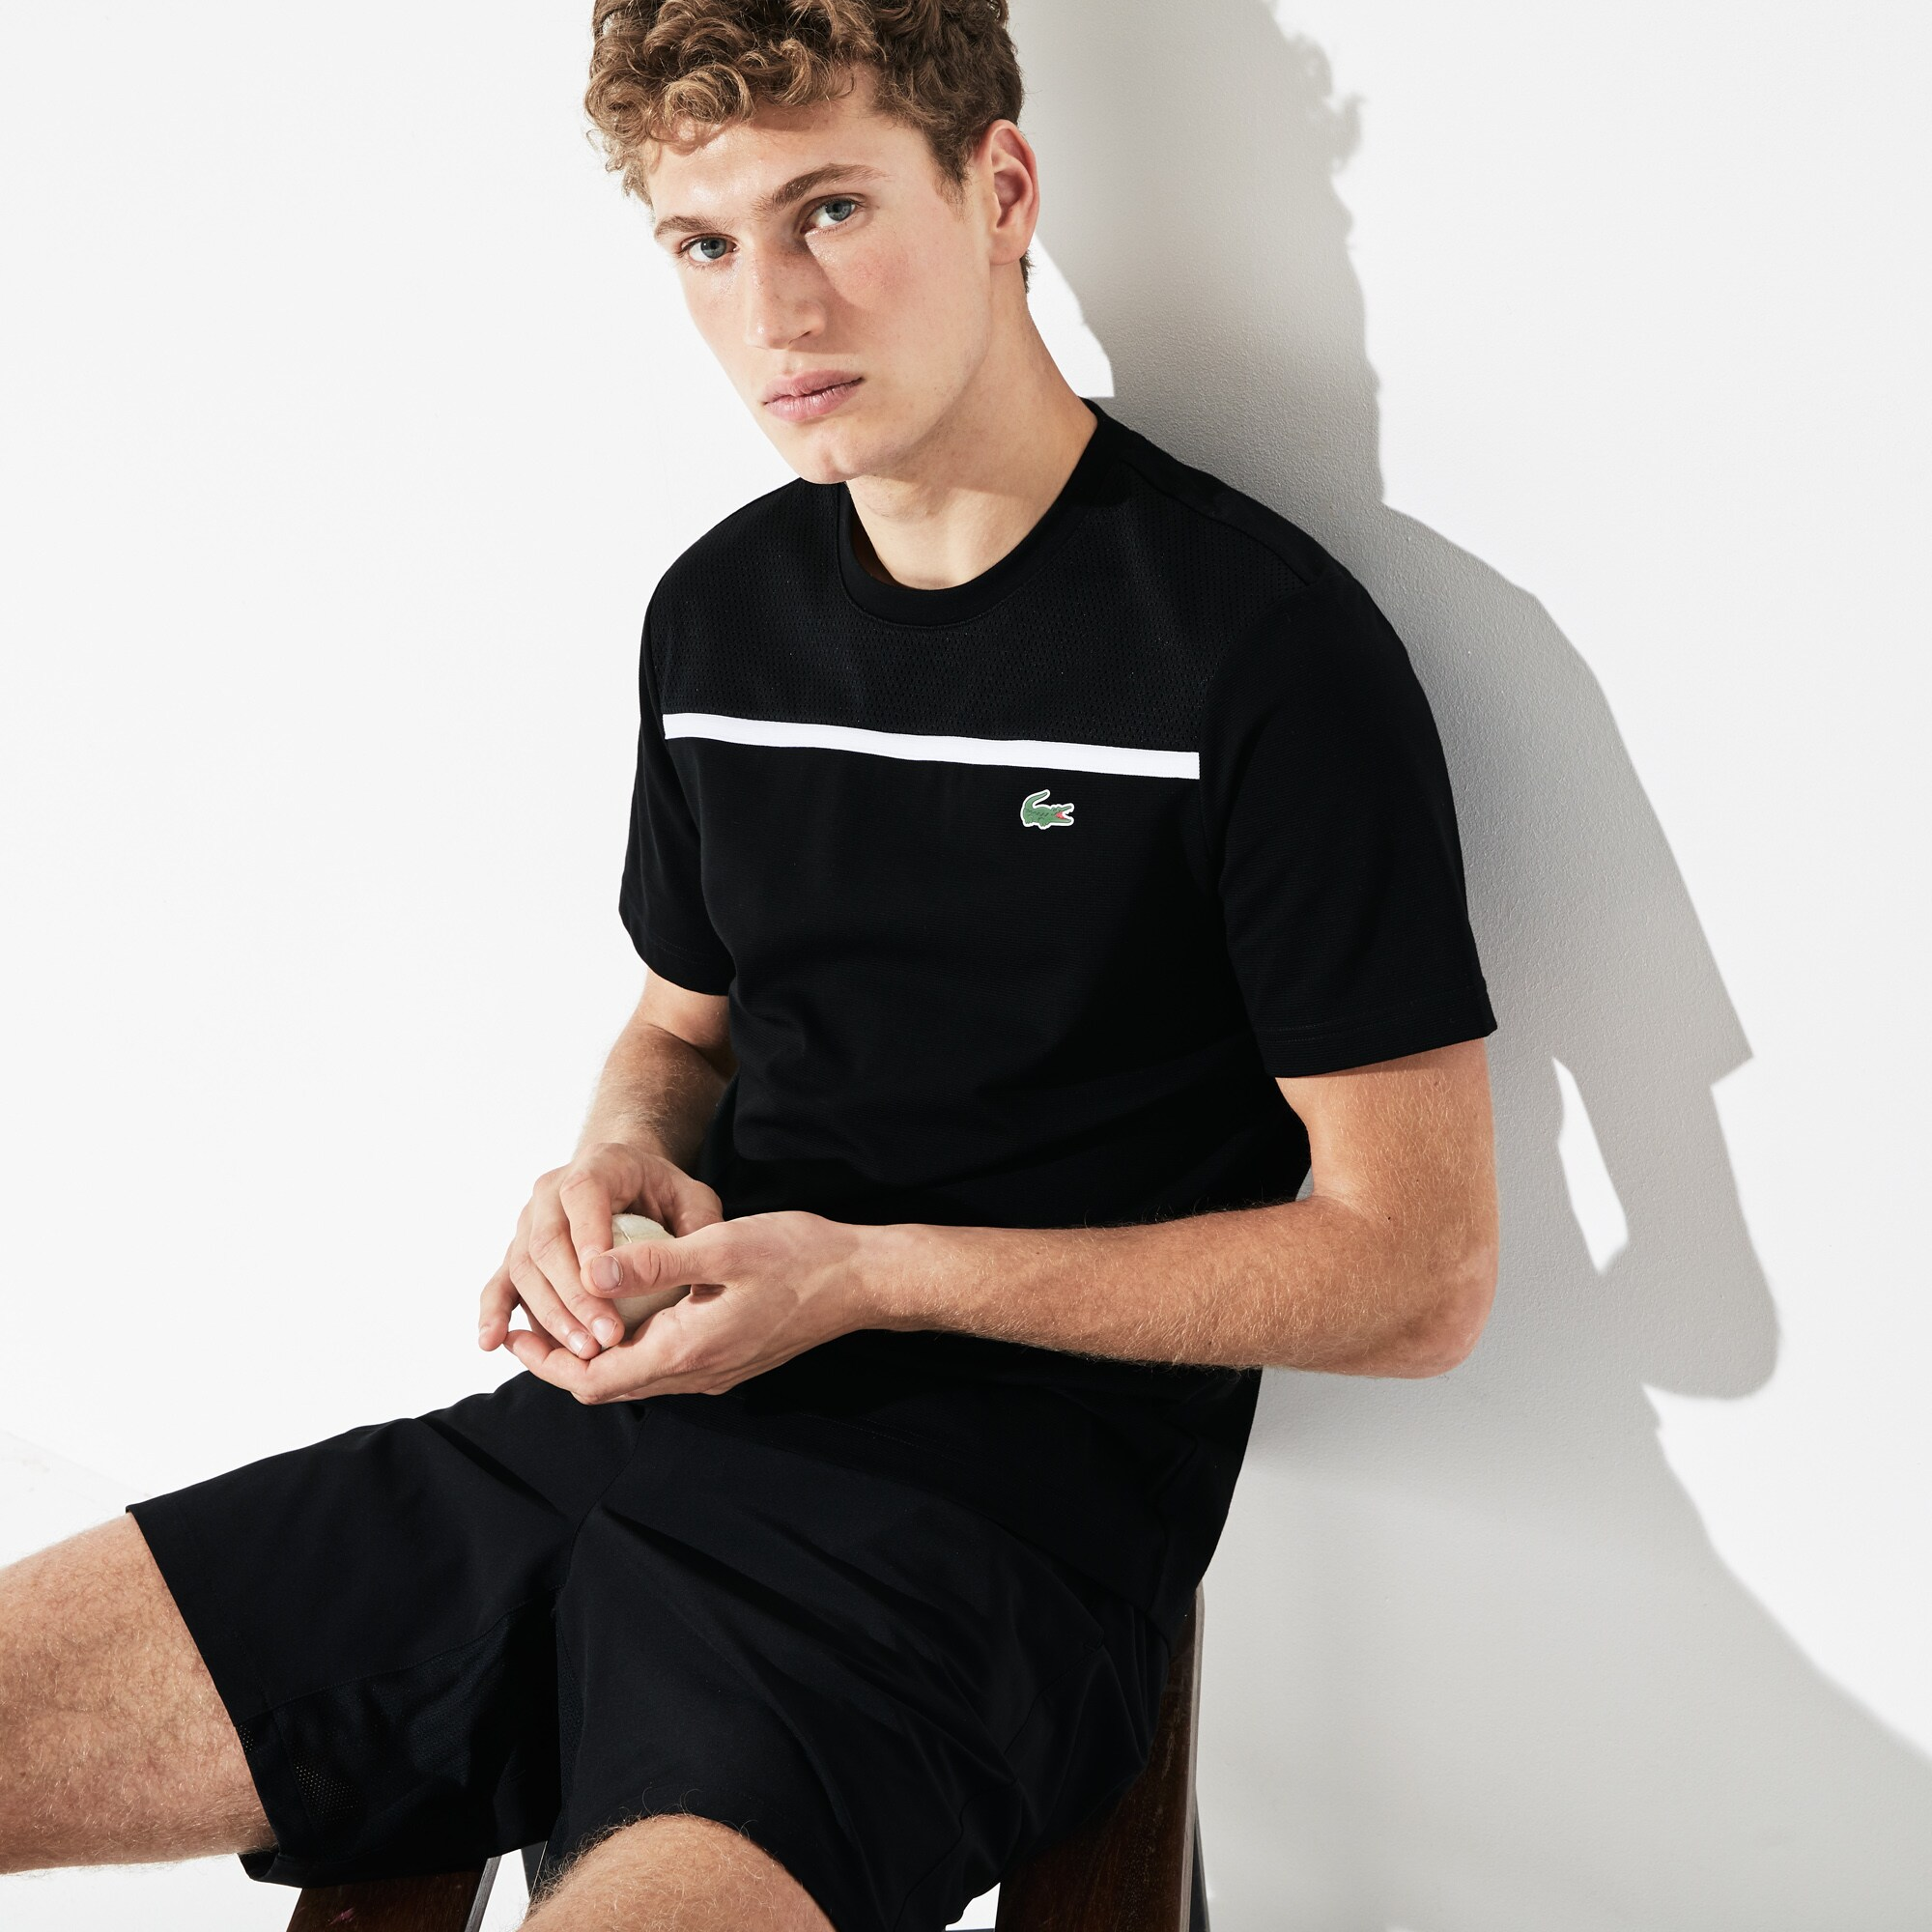 49b161901c Men s t-shirts